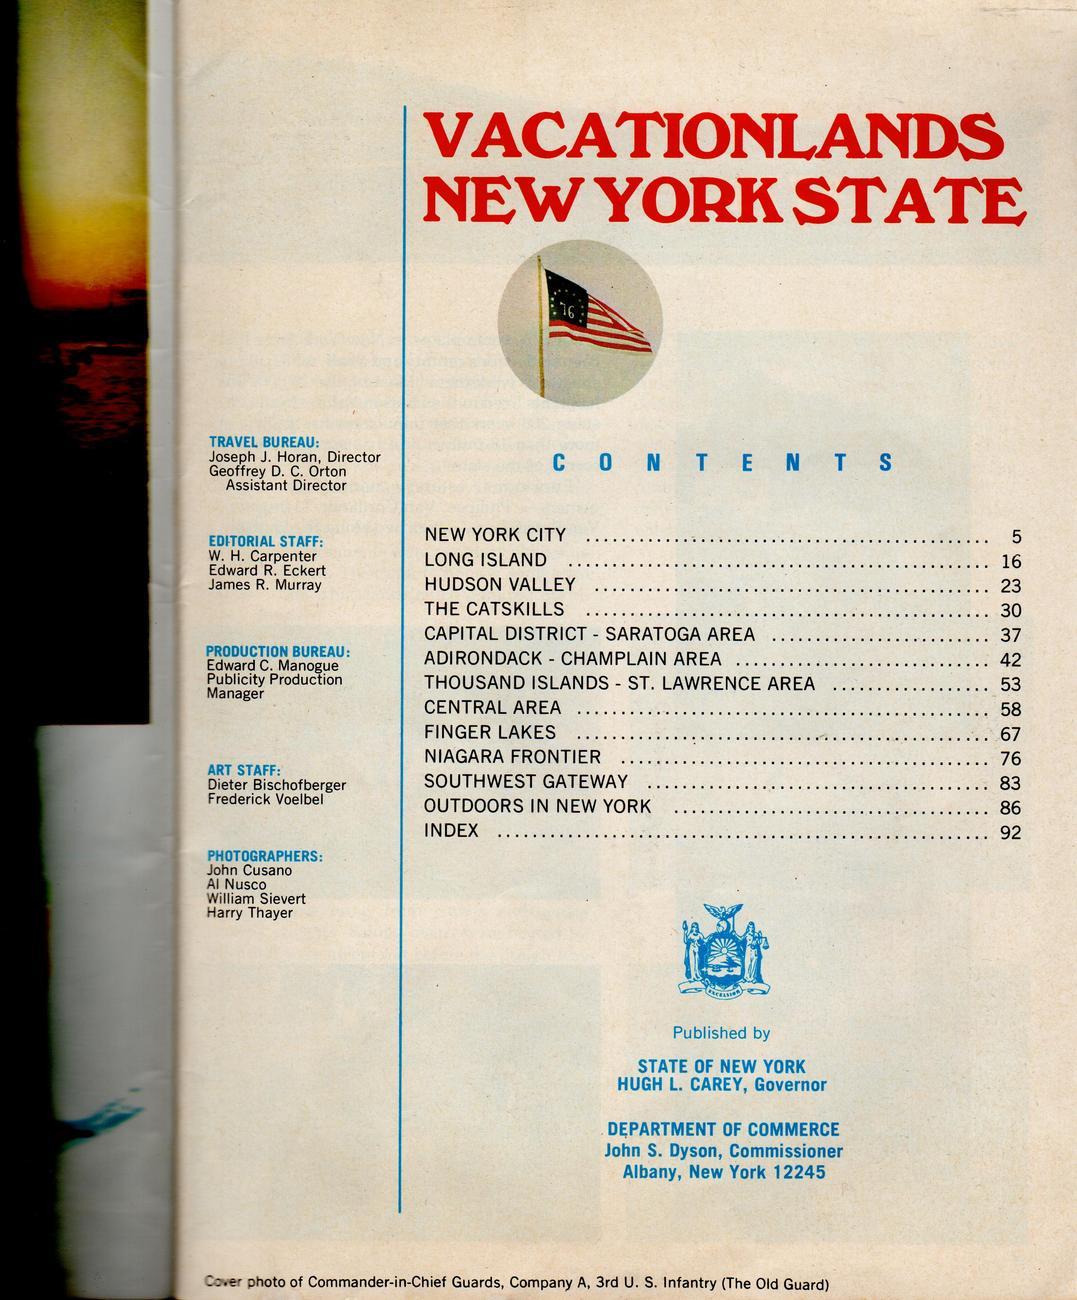 Vactionlands New York State Bicentennial Edition [Paperback]